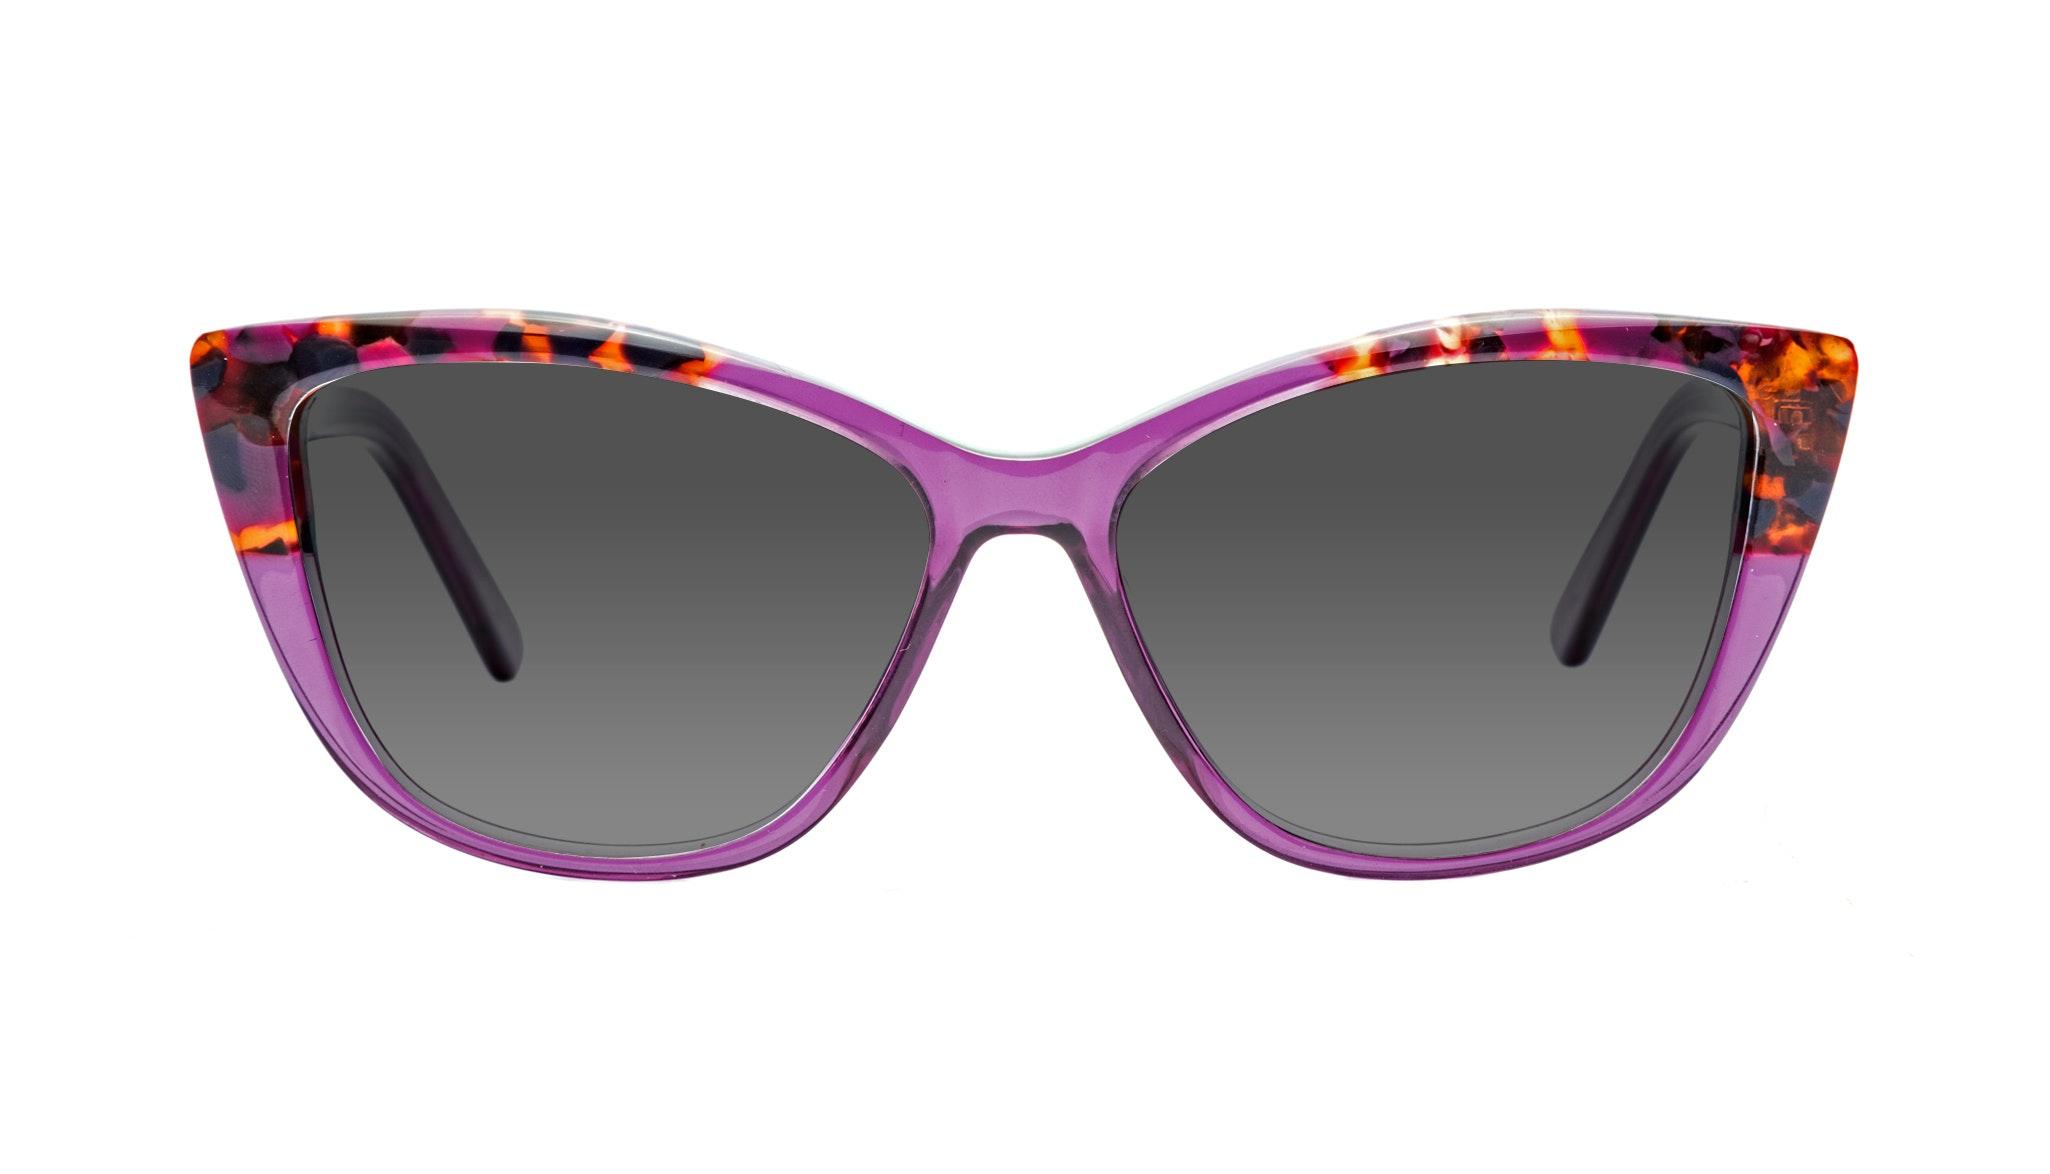 Affordable Fashion Glasses Cat Eye Sunglasses Women Dolled Up Pretty Purple